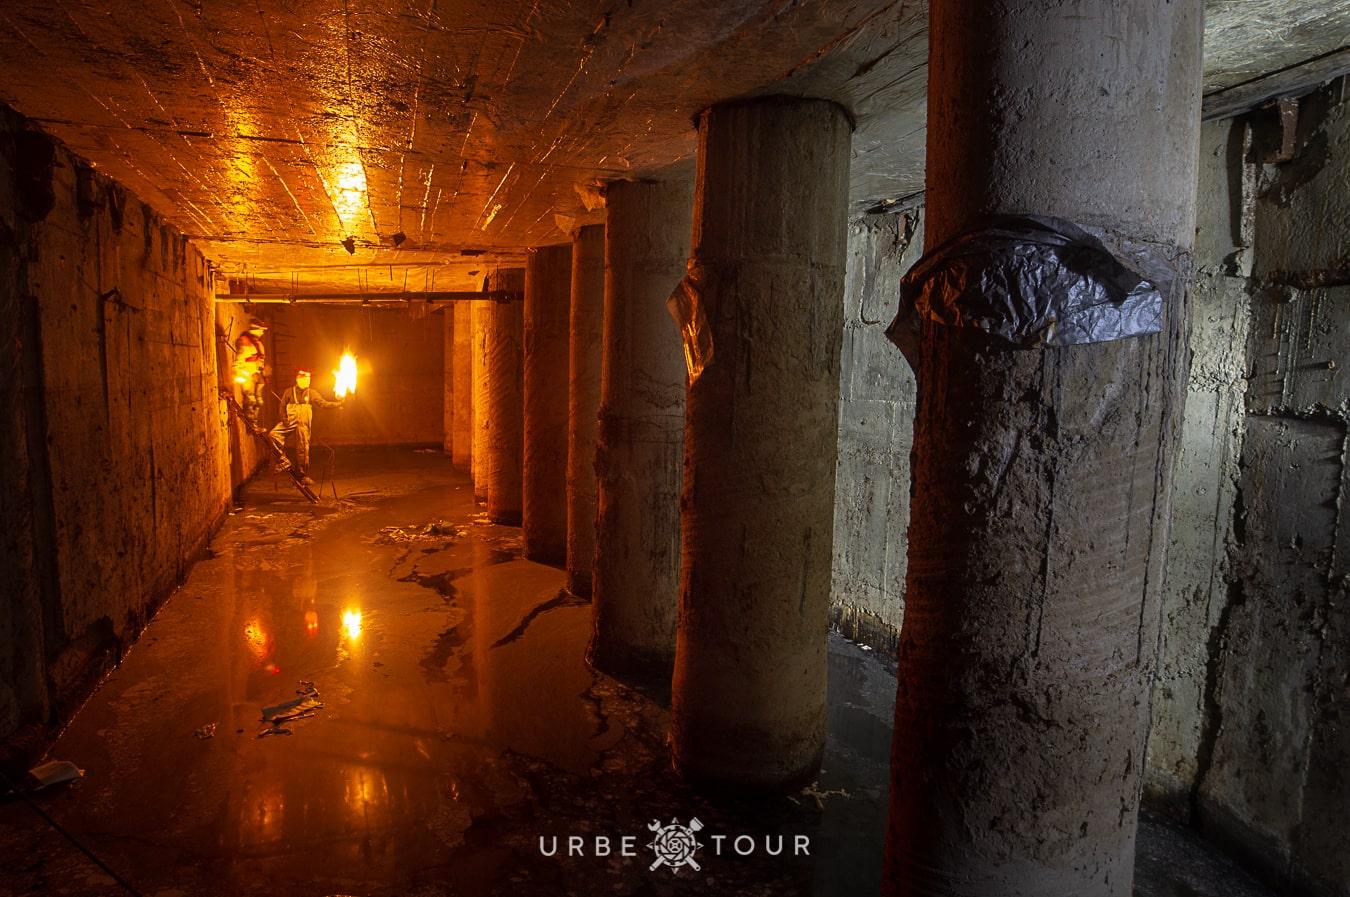 skomoroh-underground-river14 Подземная река Скоморох - 2020.01.12 16:00